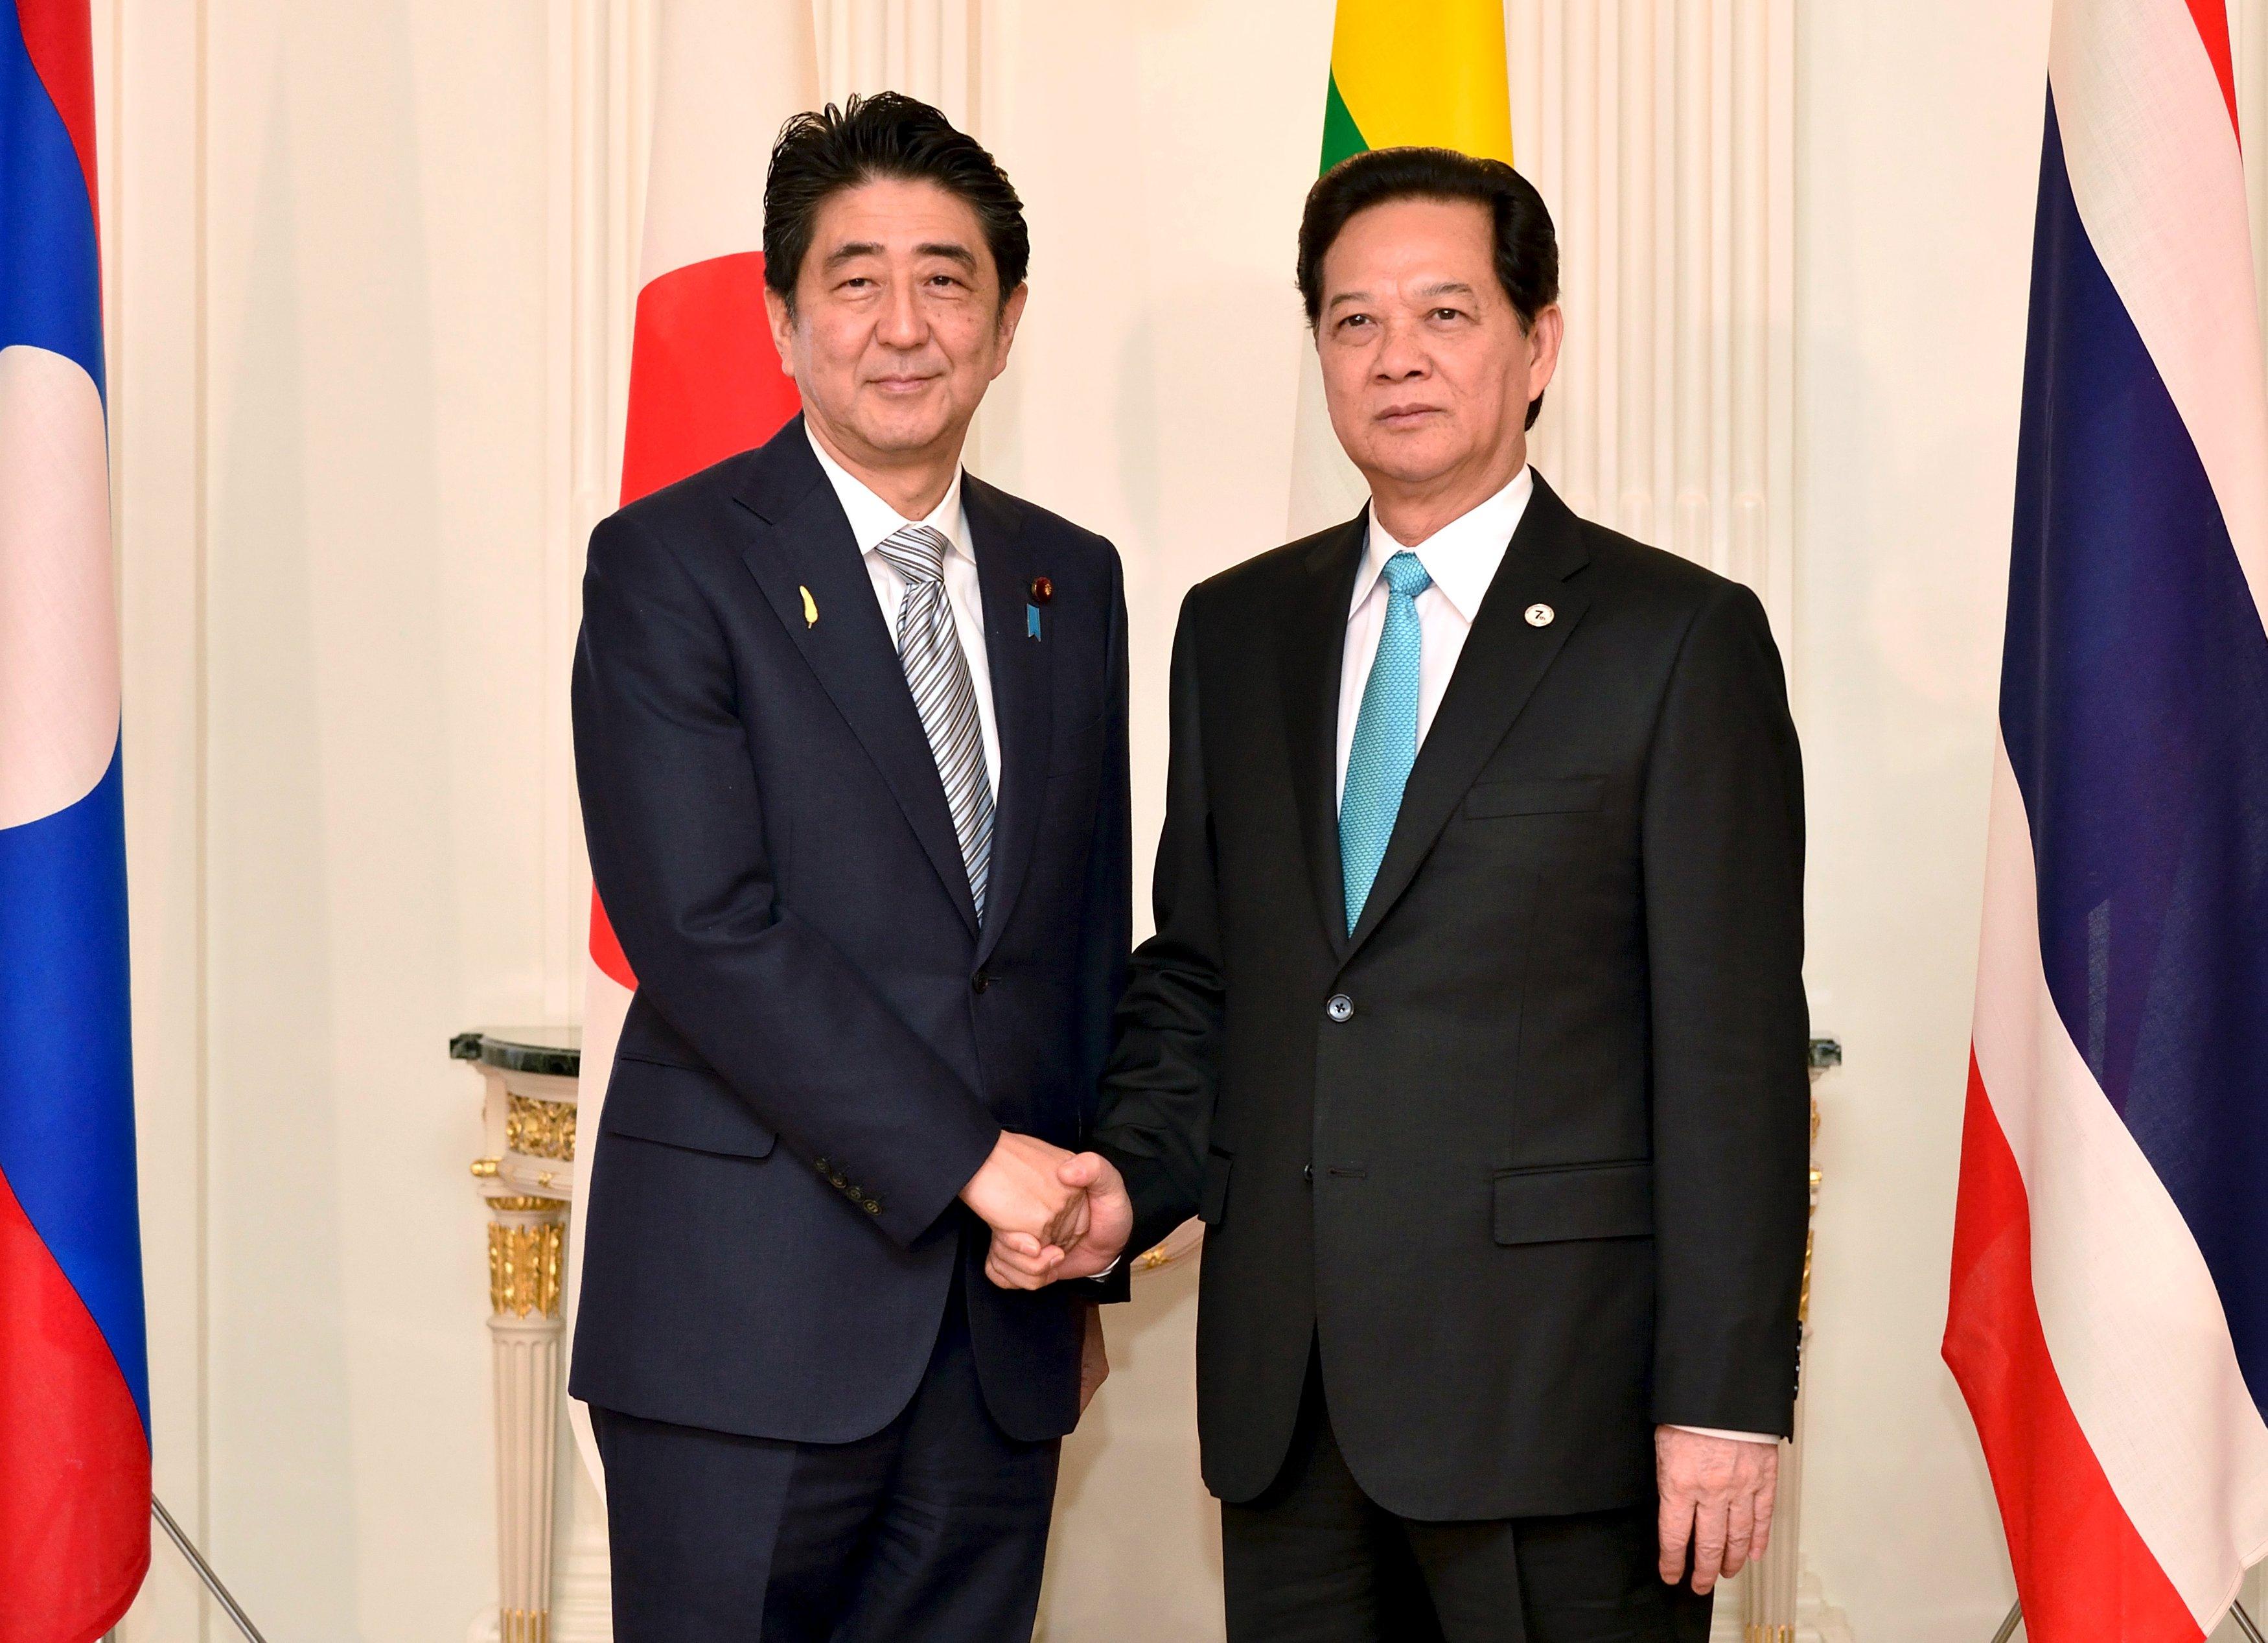 Japan pledges $6 bln to Mekong nations as China prepares new bank